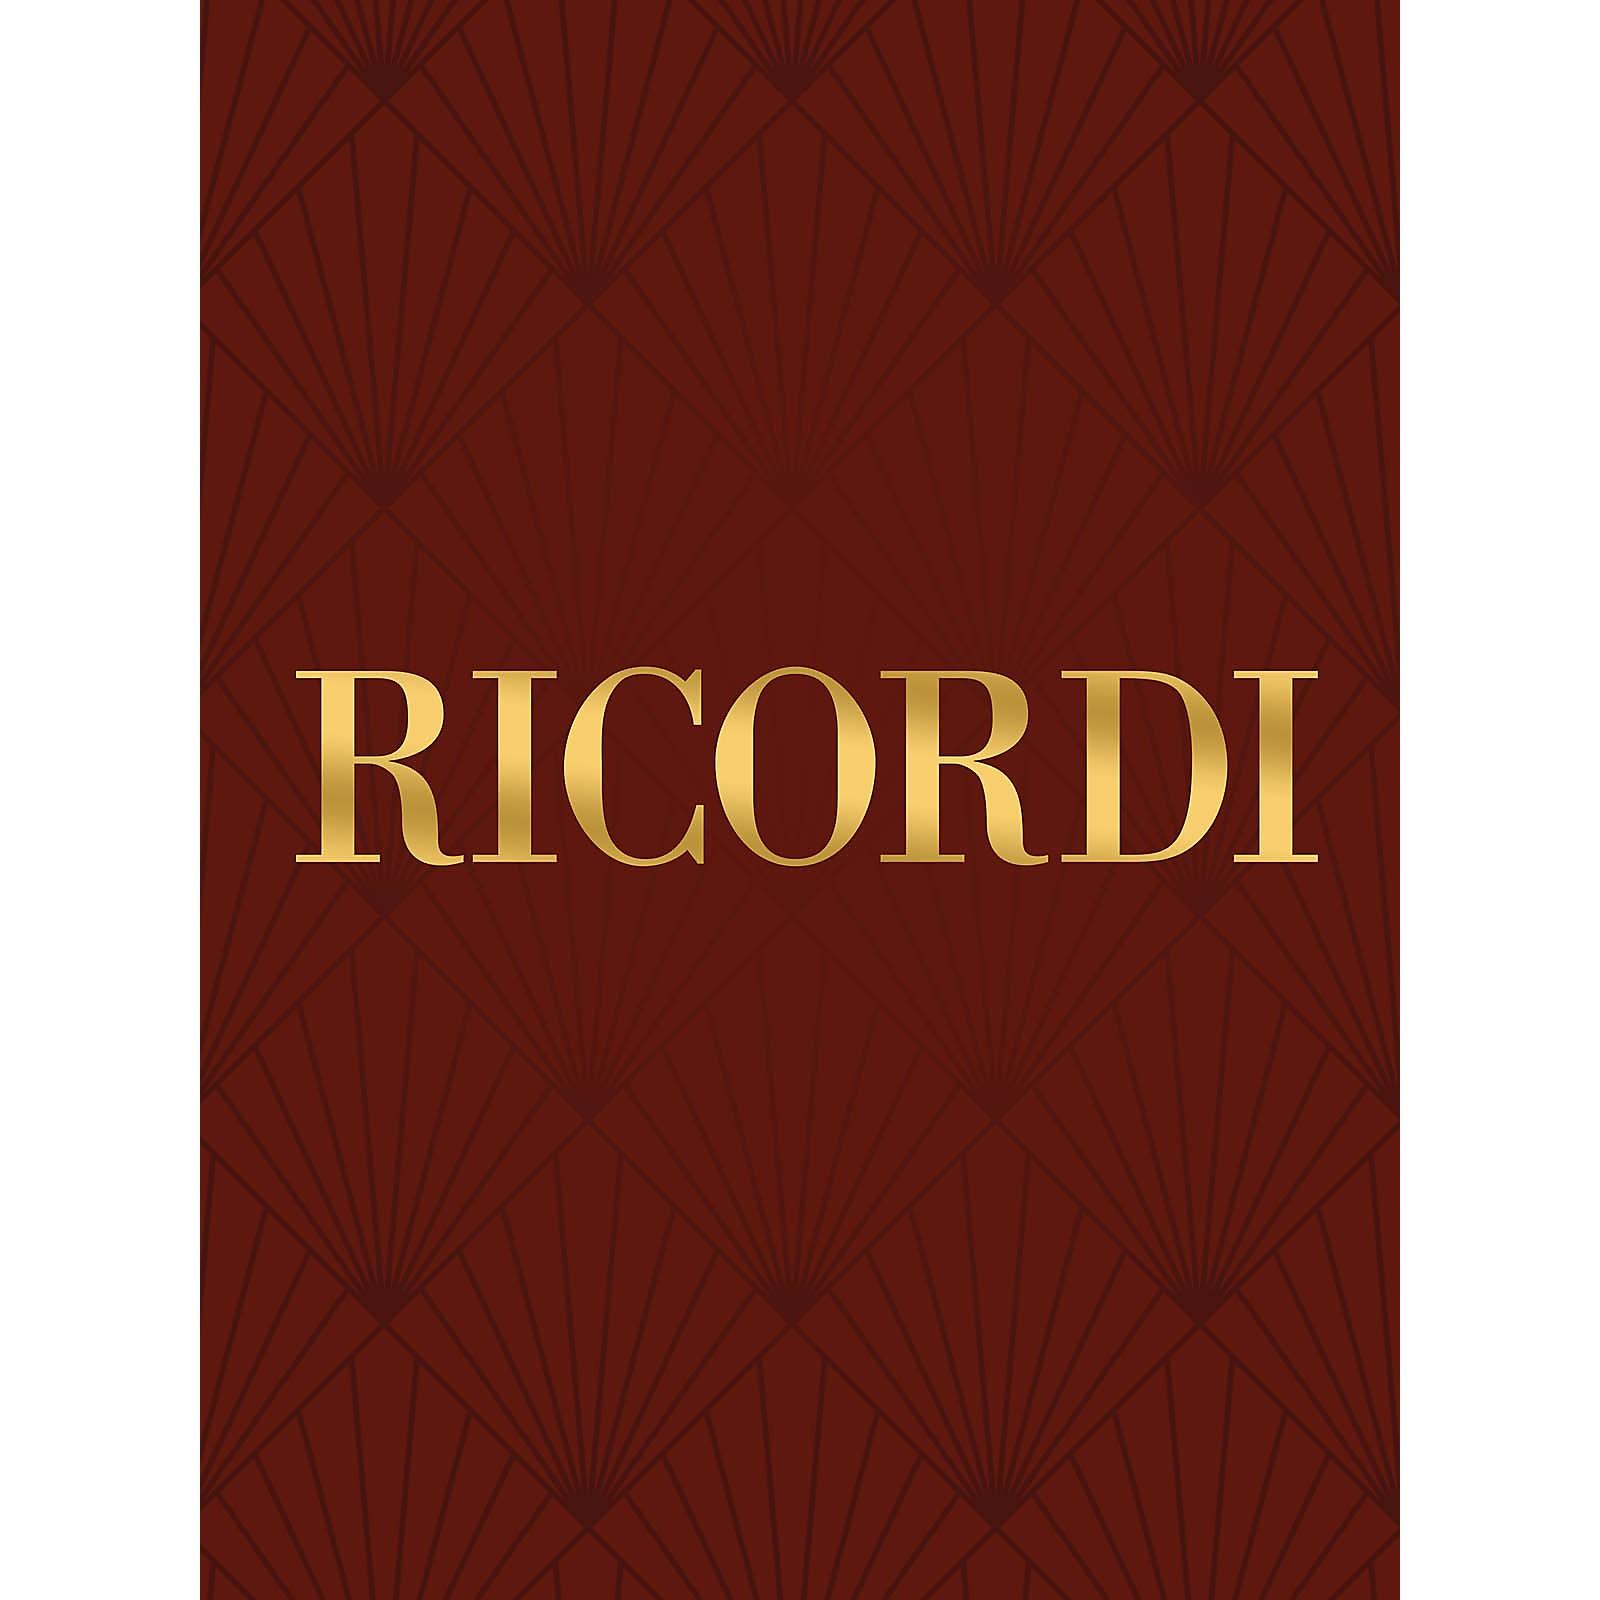 Ricordi Kyrie RV587 (Vocal Score) Vocal Score Composed by Antonio Vivaldi Edited by Vilmos Lesko